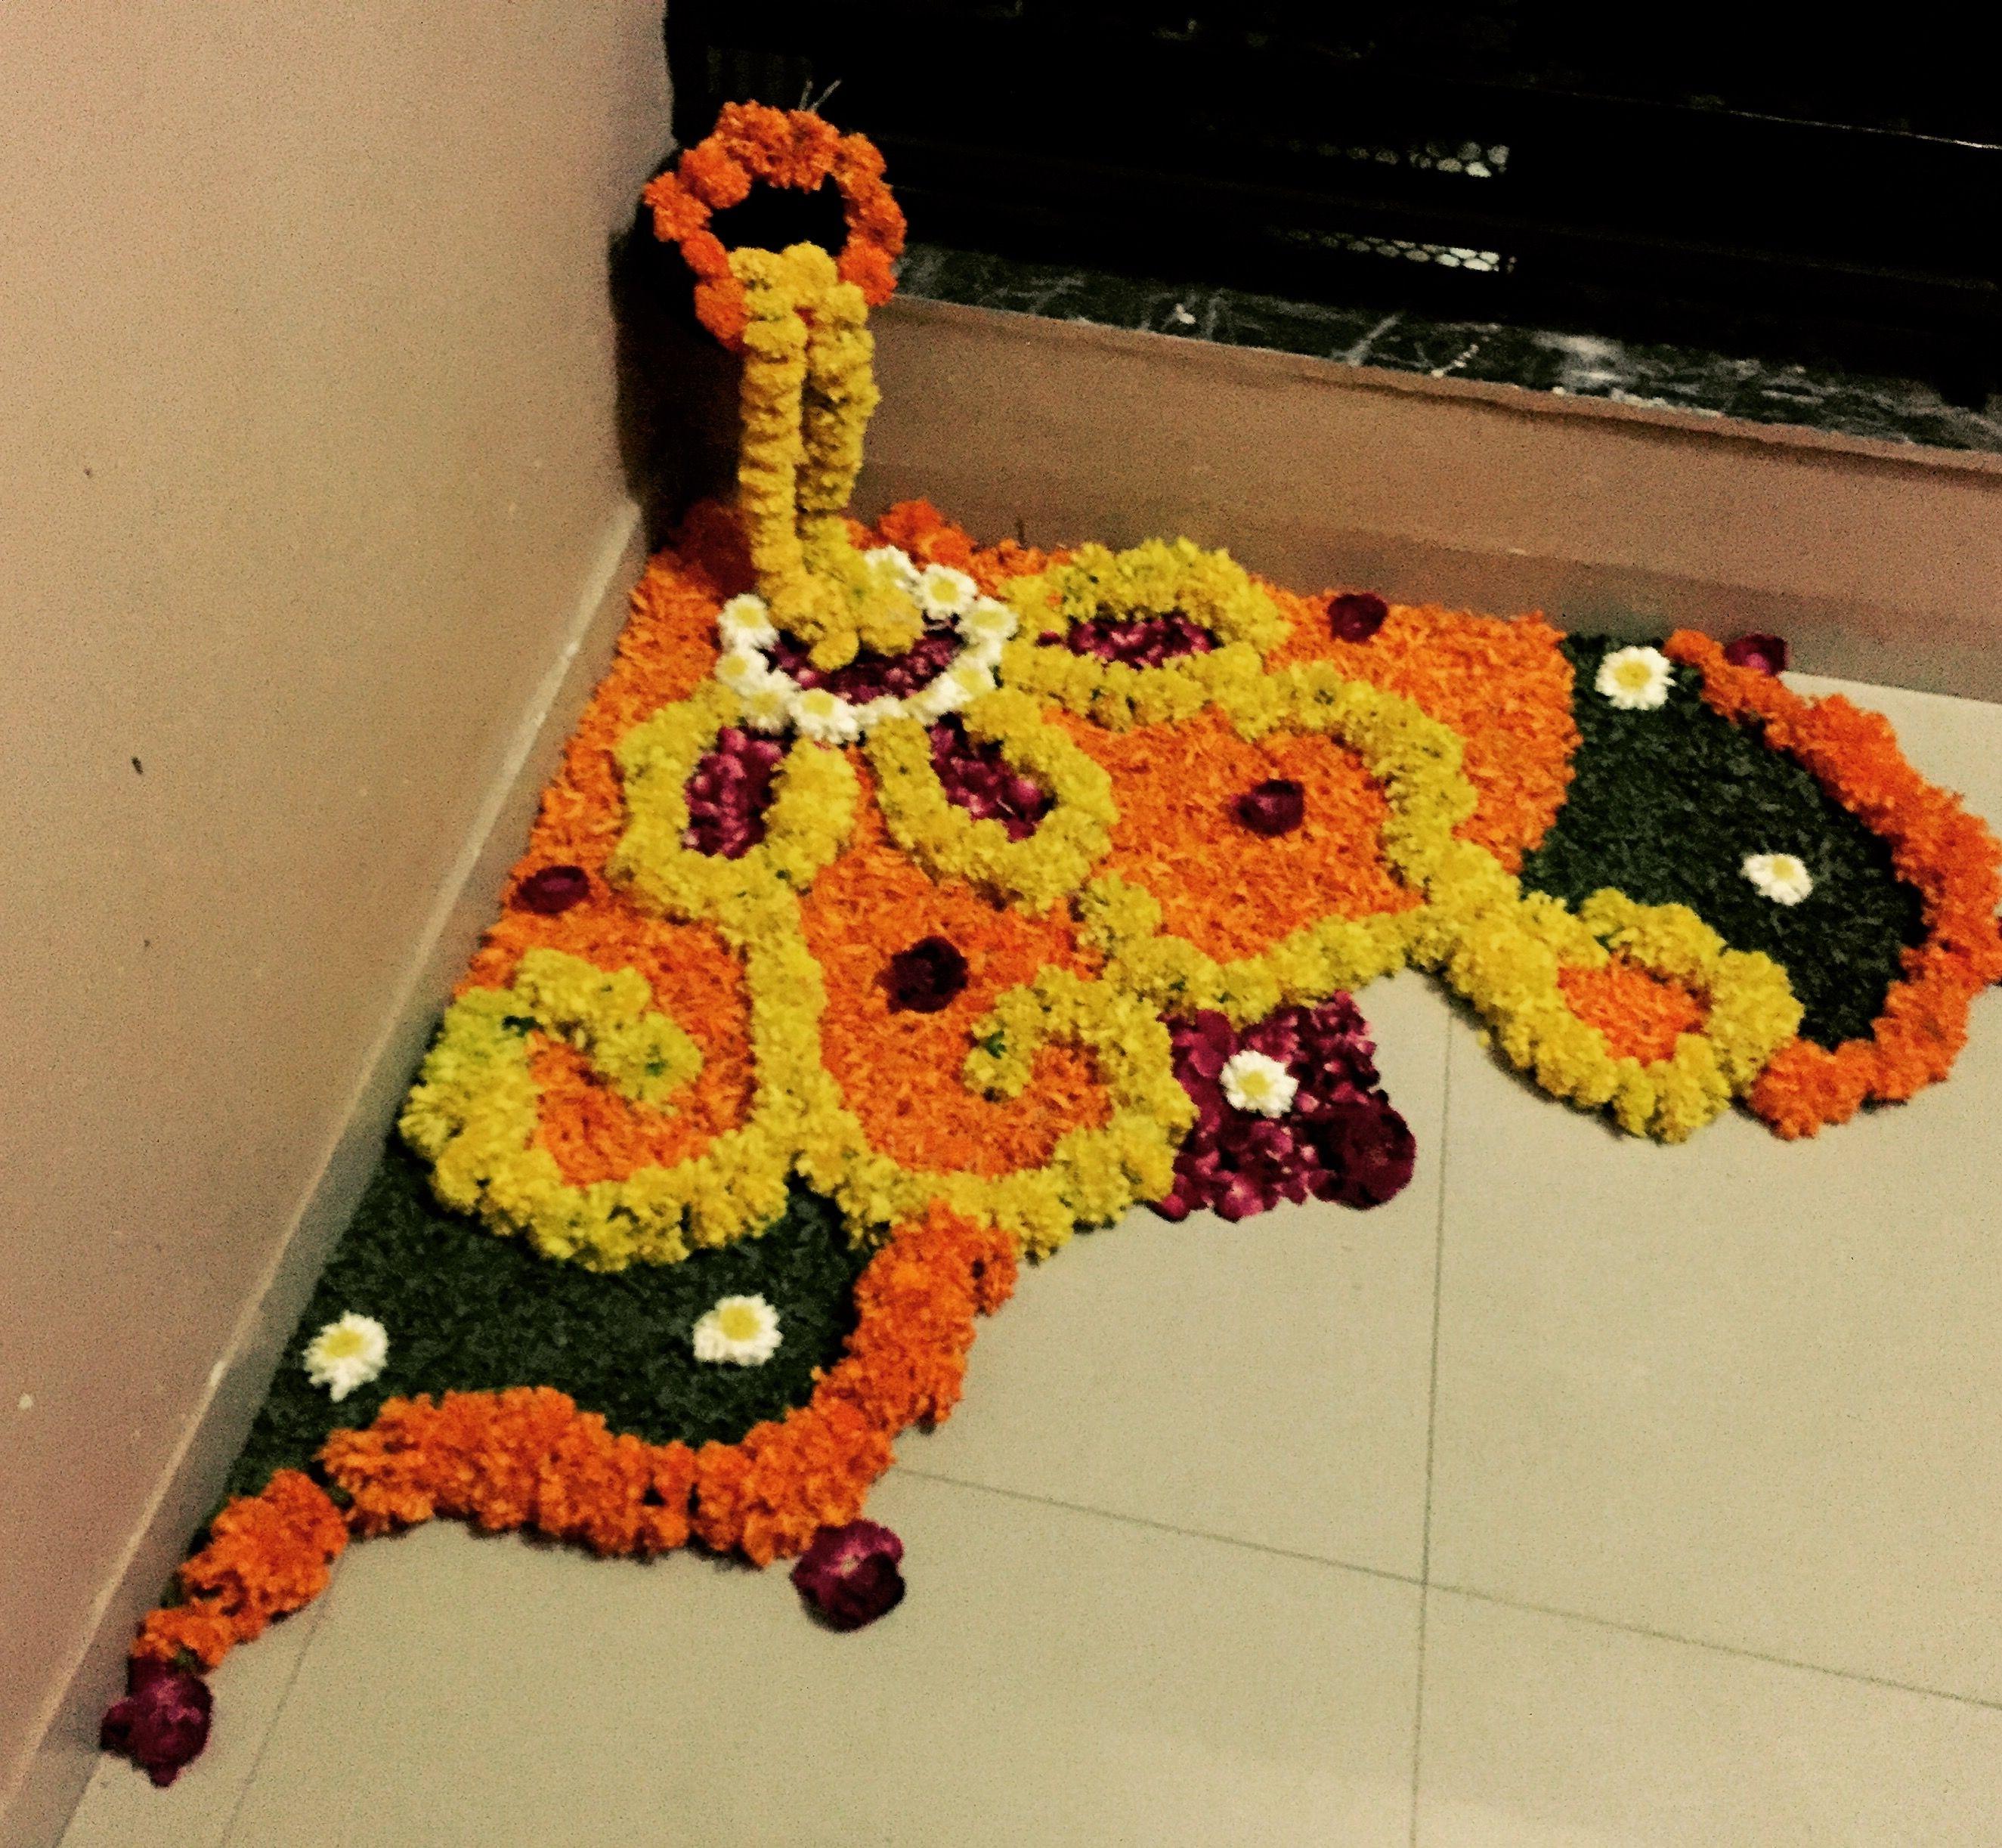 Diy House Housewarming Flower Rangoli Floor Decoration Using Flower Petals Leaves Rangoli Designs Flower Diy Diwali Decorations Diwali Decorations